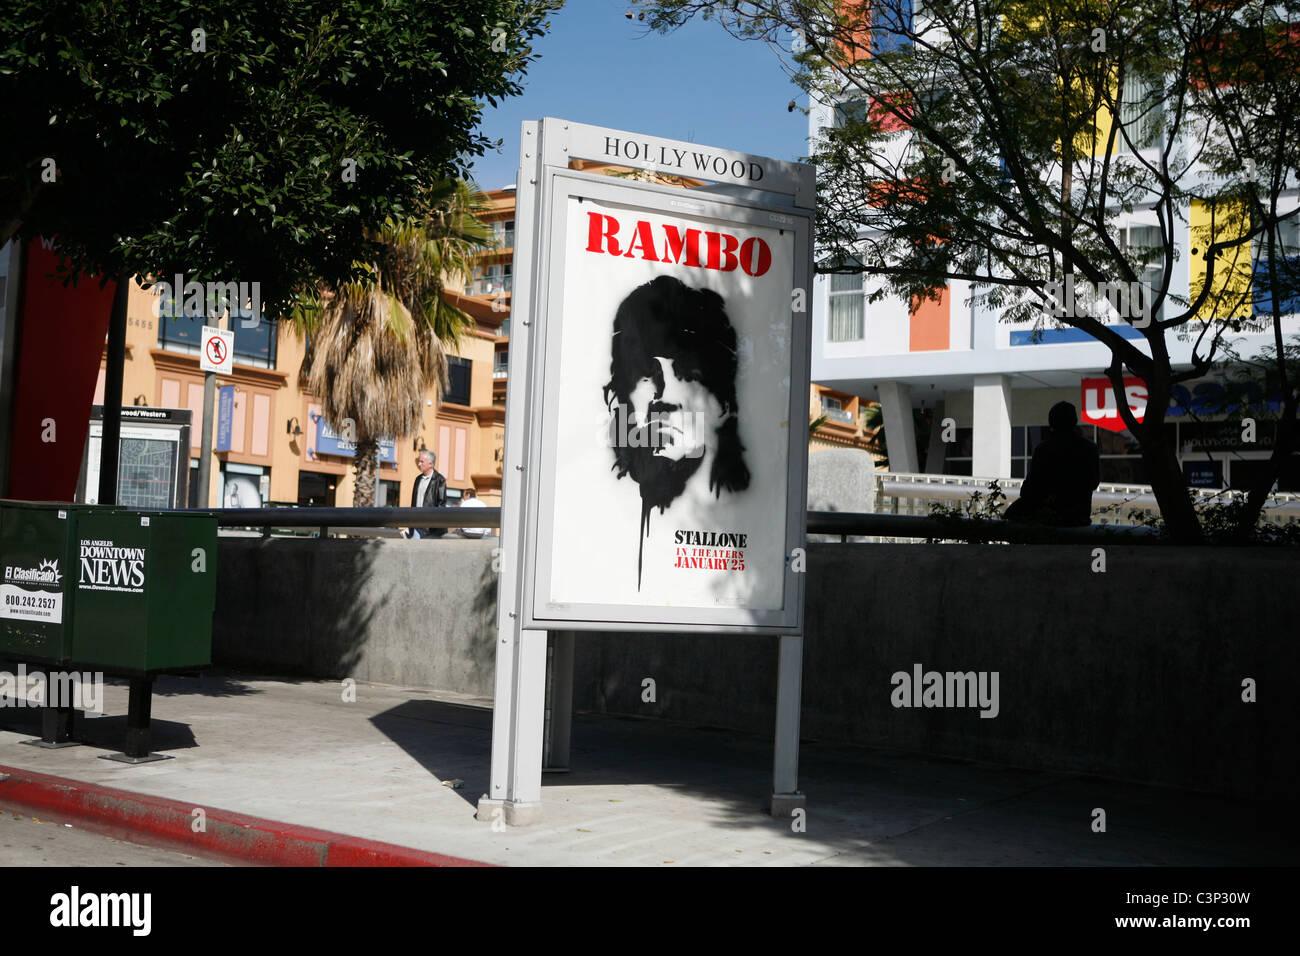 rambo movie advertisement street art stencil style hollywood visual chaos movie industry LA los angeles street scene - Stock Image